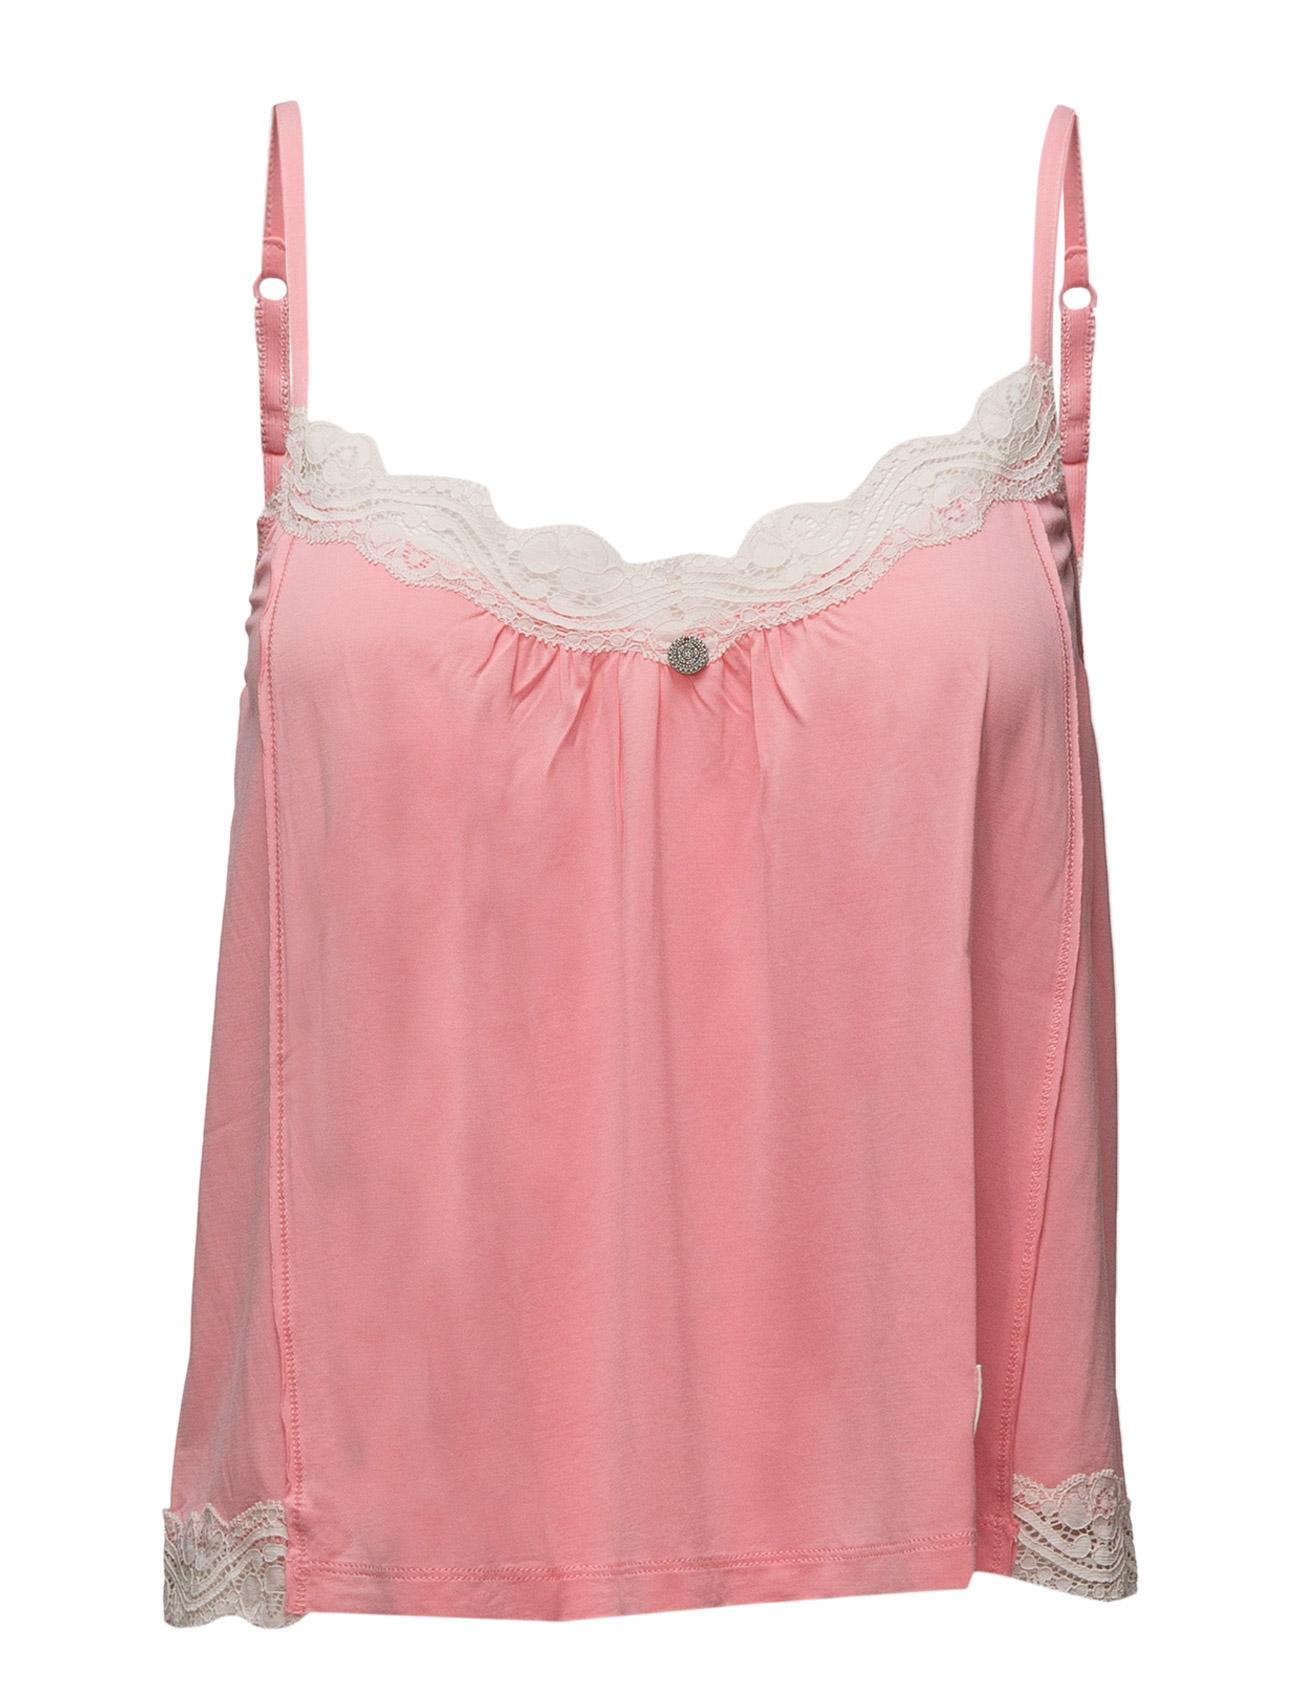 Cheery Slip Tank ODD MOLLY UNDERWEAR & SWIMWEAR Loungewear til Kvinder i Næsten Sort